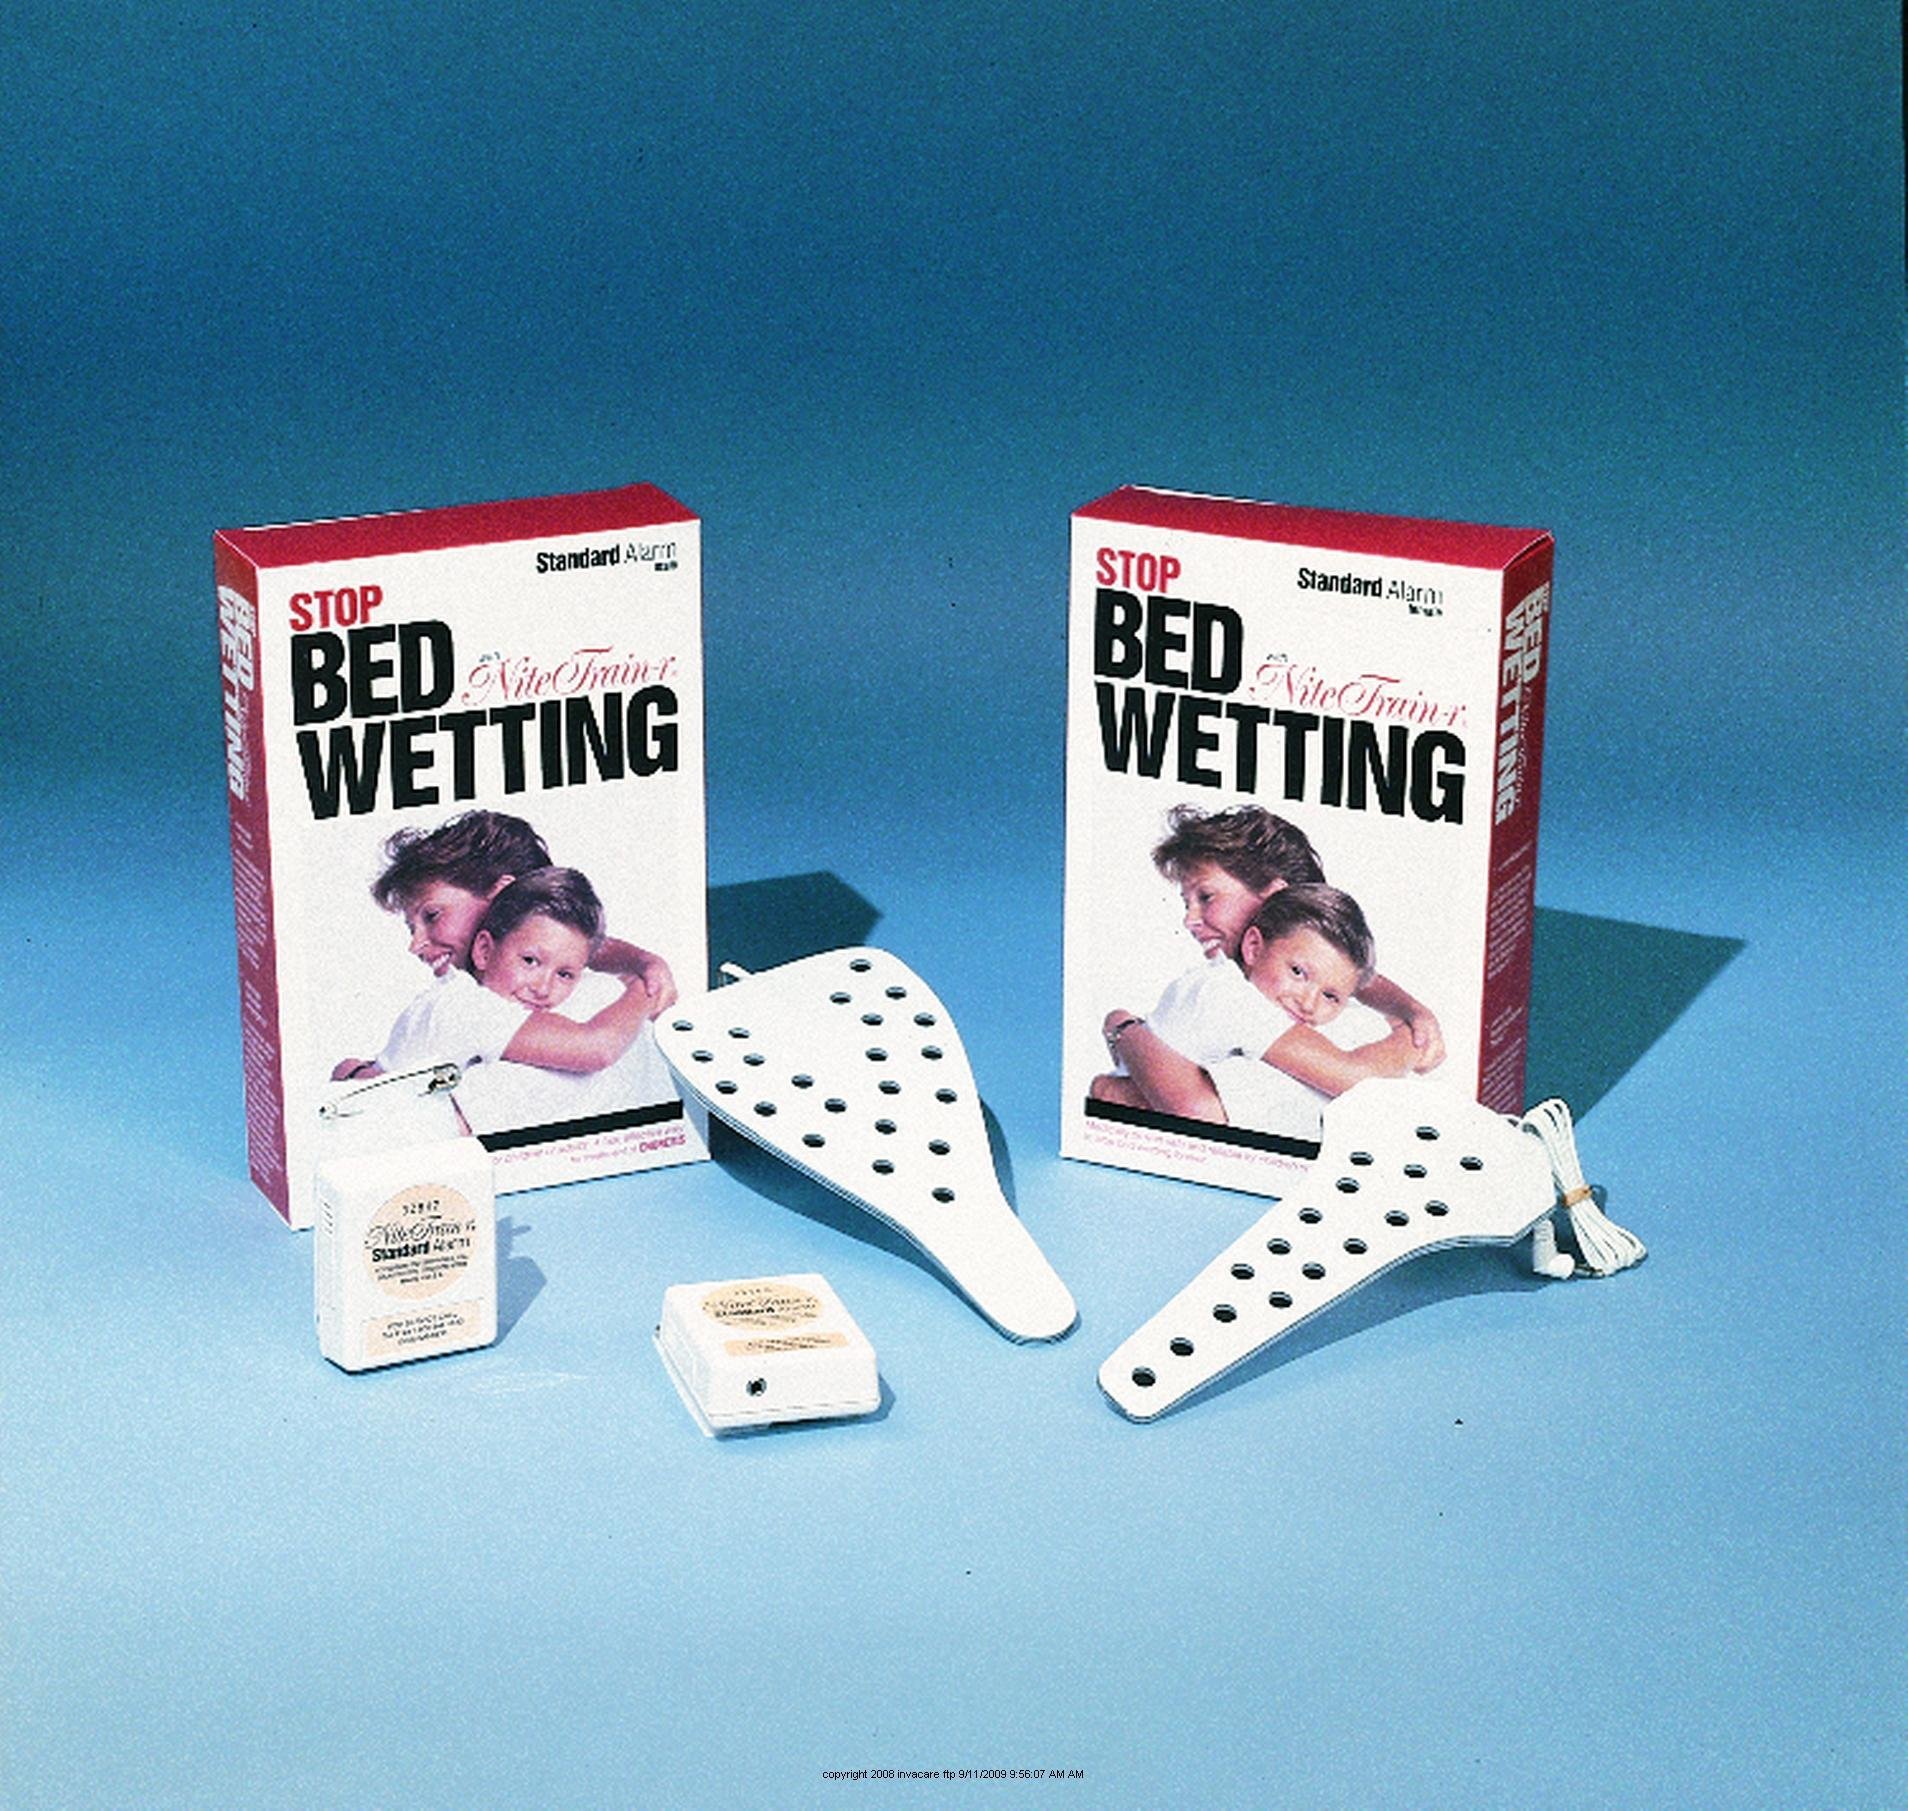 D.V.C. Bedwetting Alarm [DVC BEDWETTING ALARM M] (EA-1)